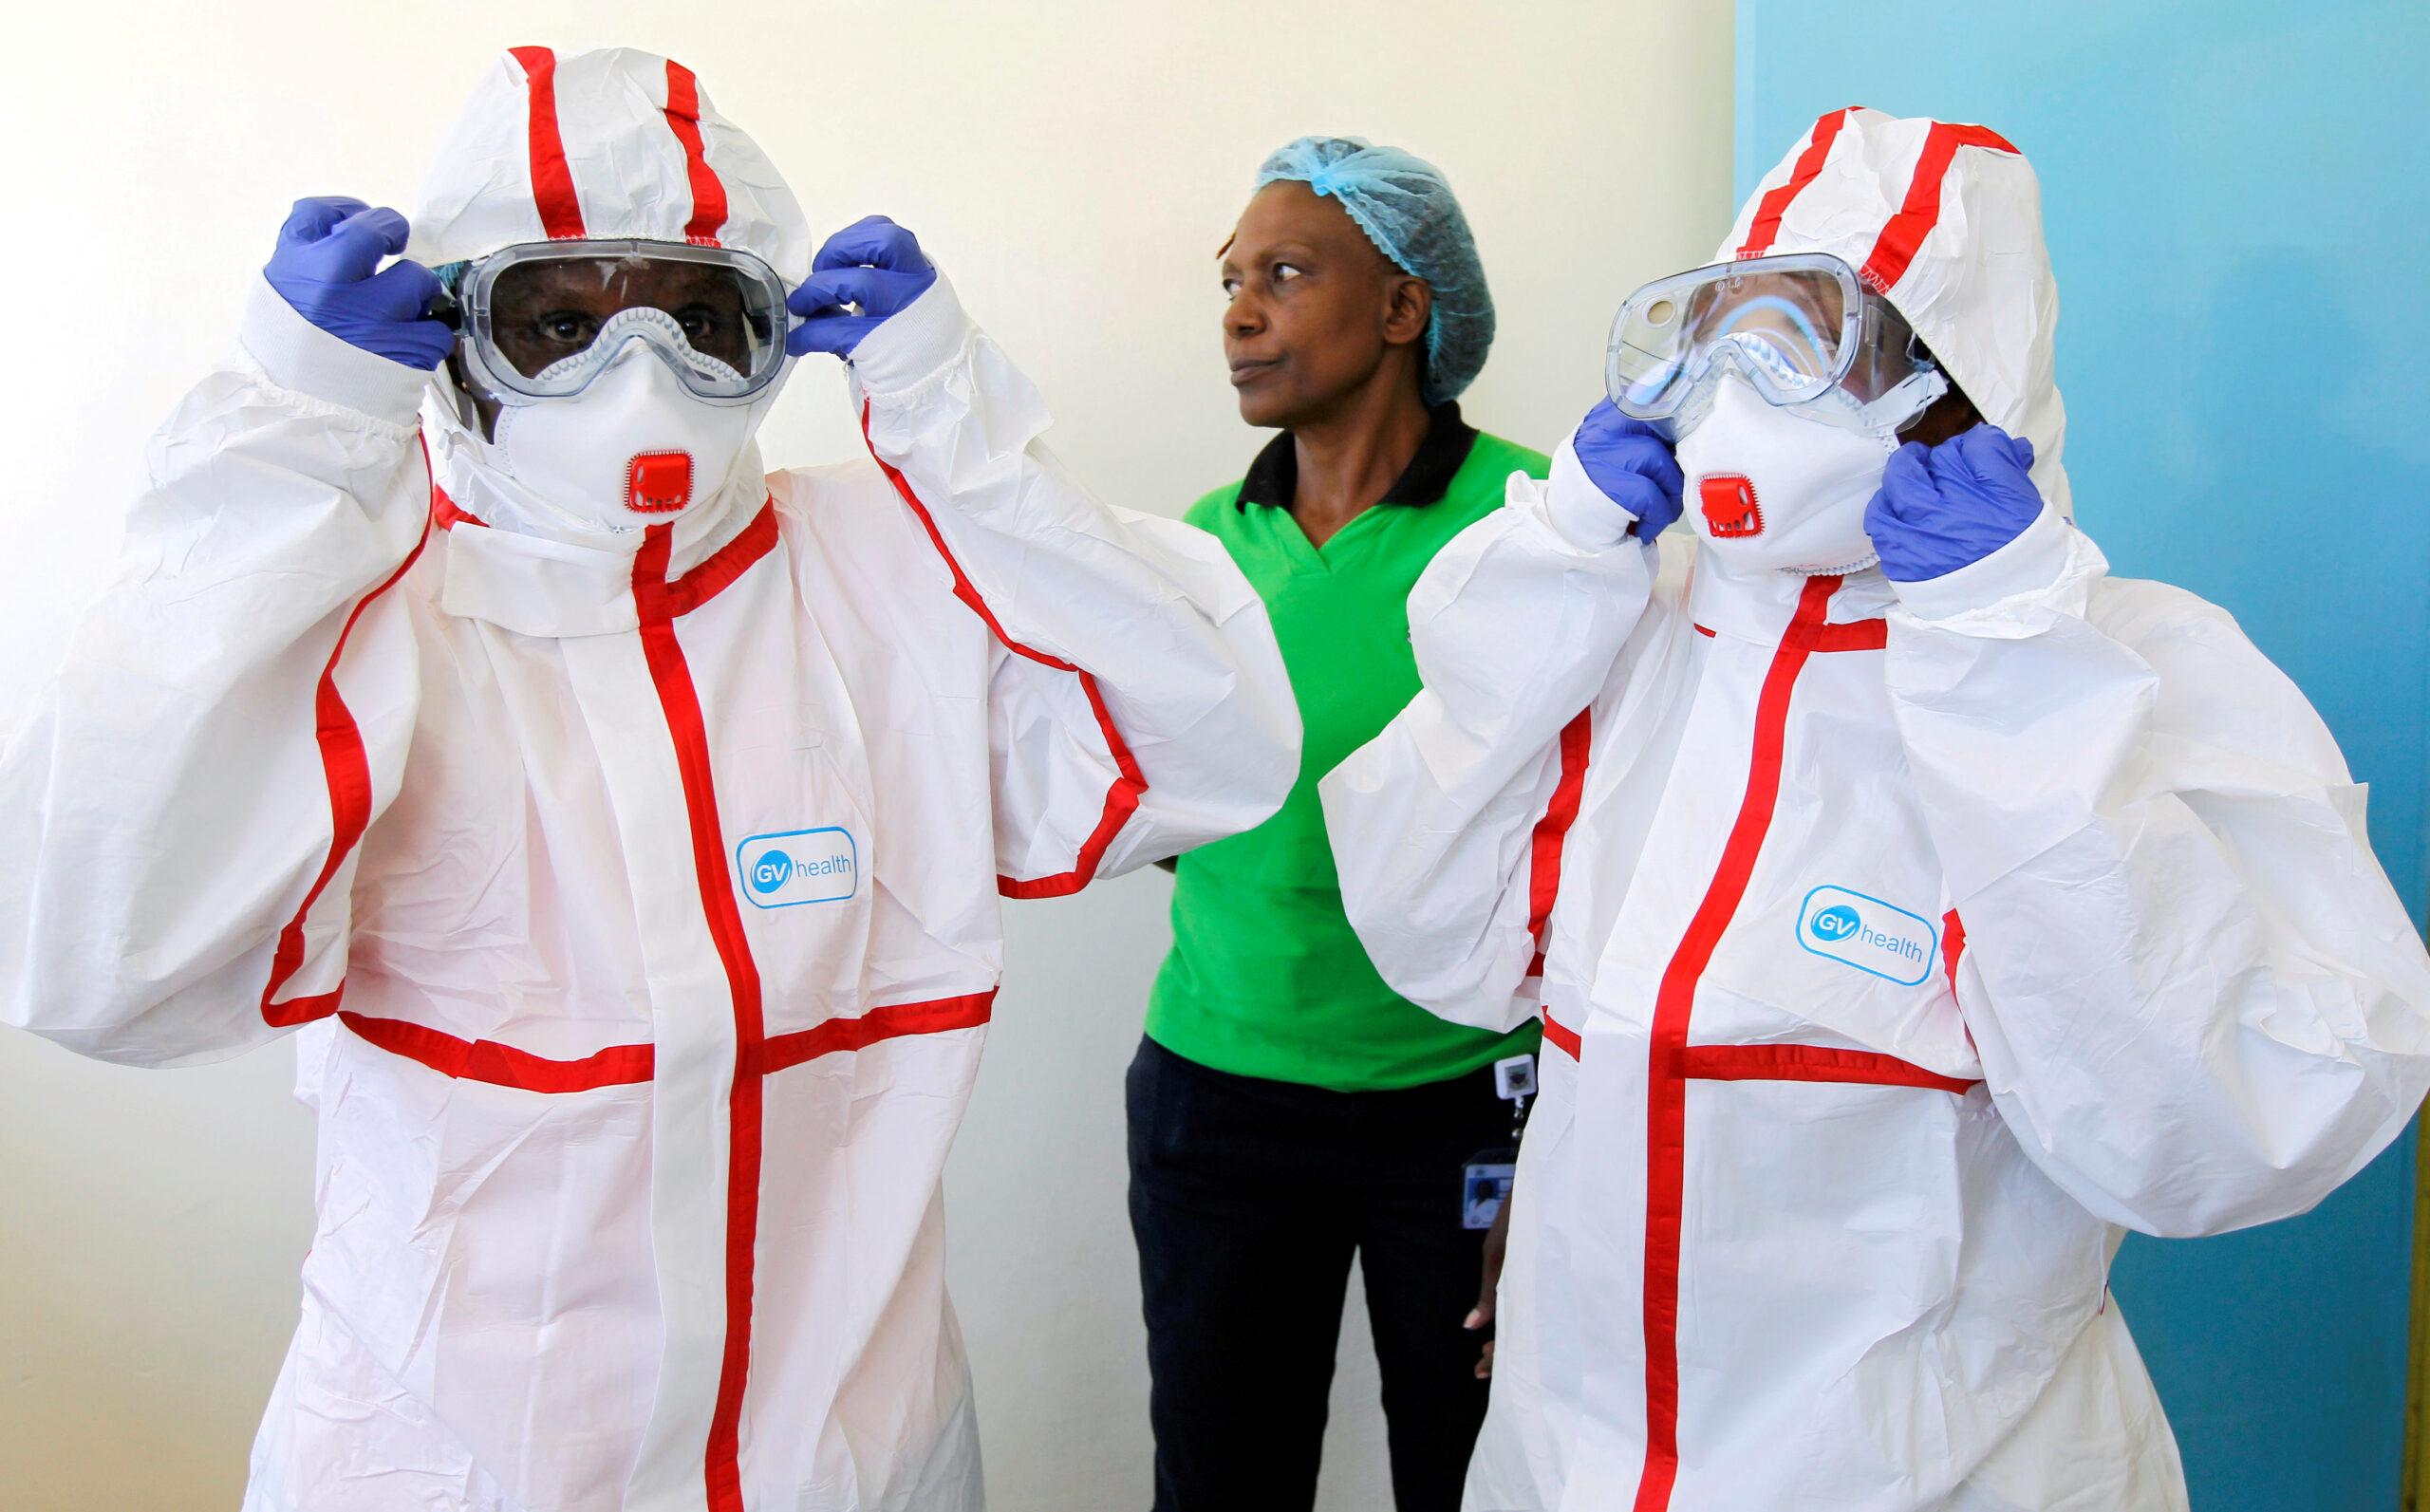 Sad! Coronavirus kills 10 Kenyan doctors in new surge. 46